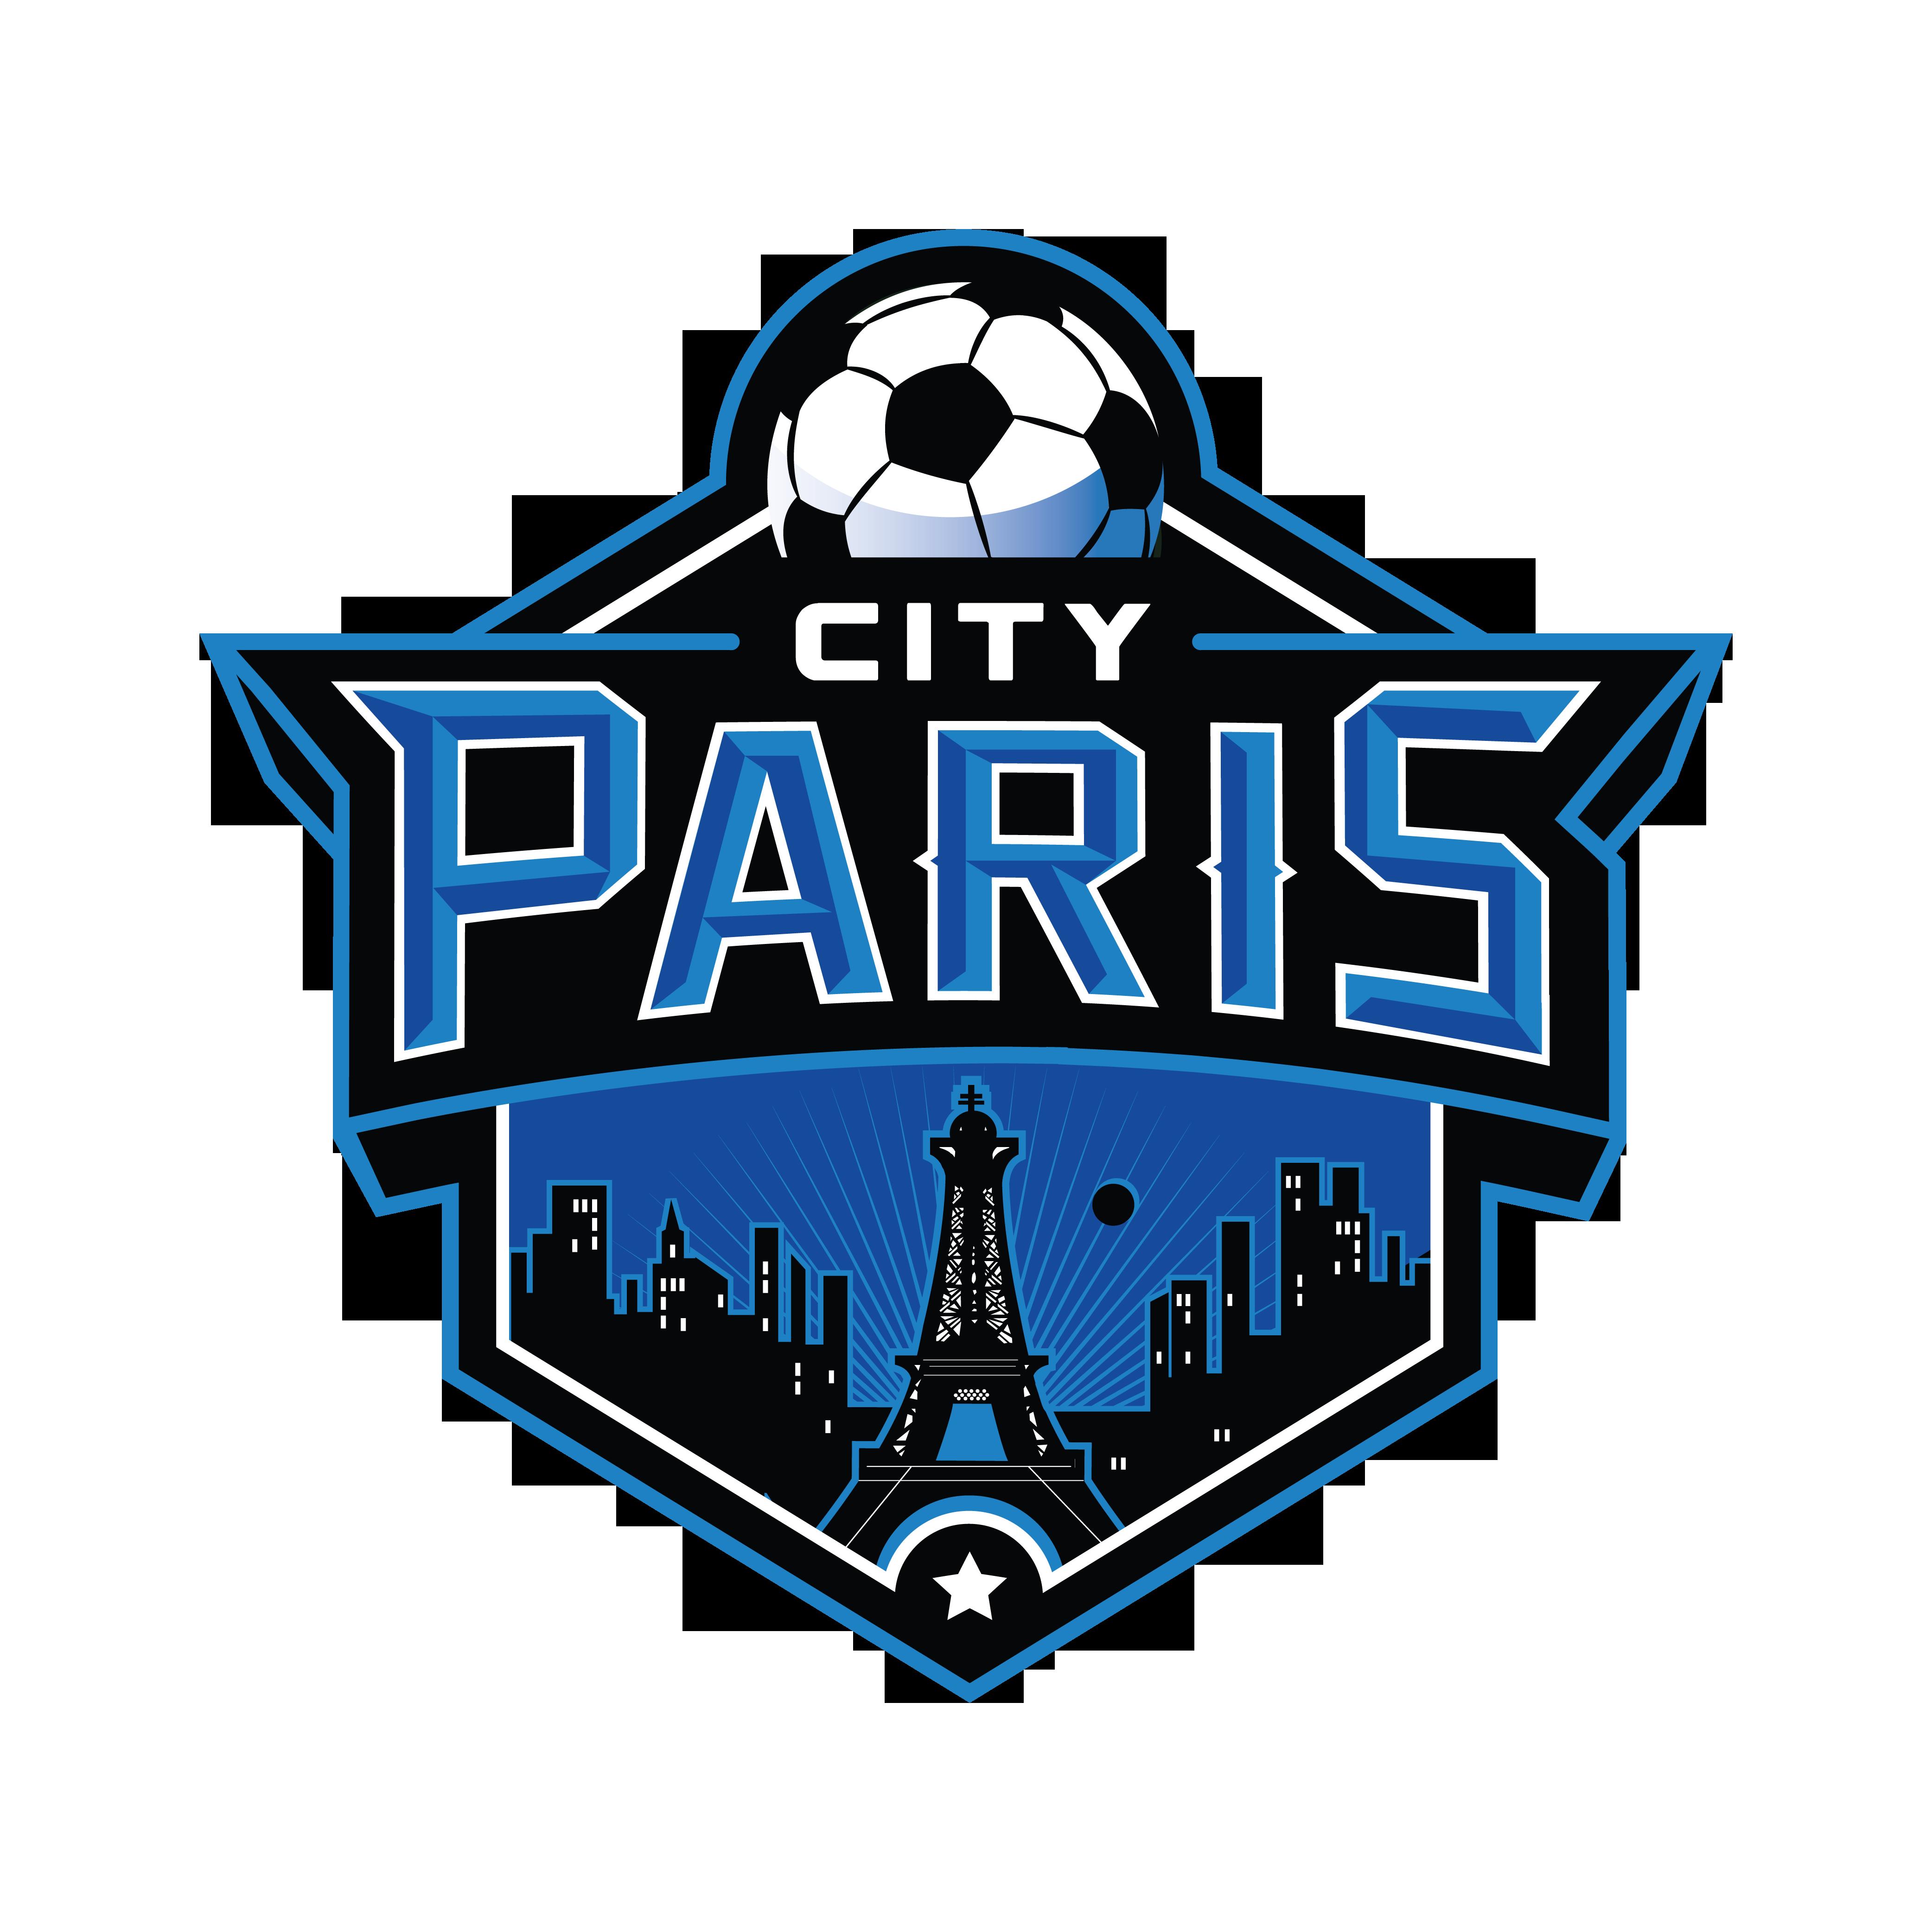 Customized Emblem/Crest Logo Design